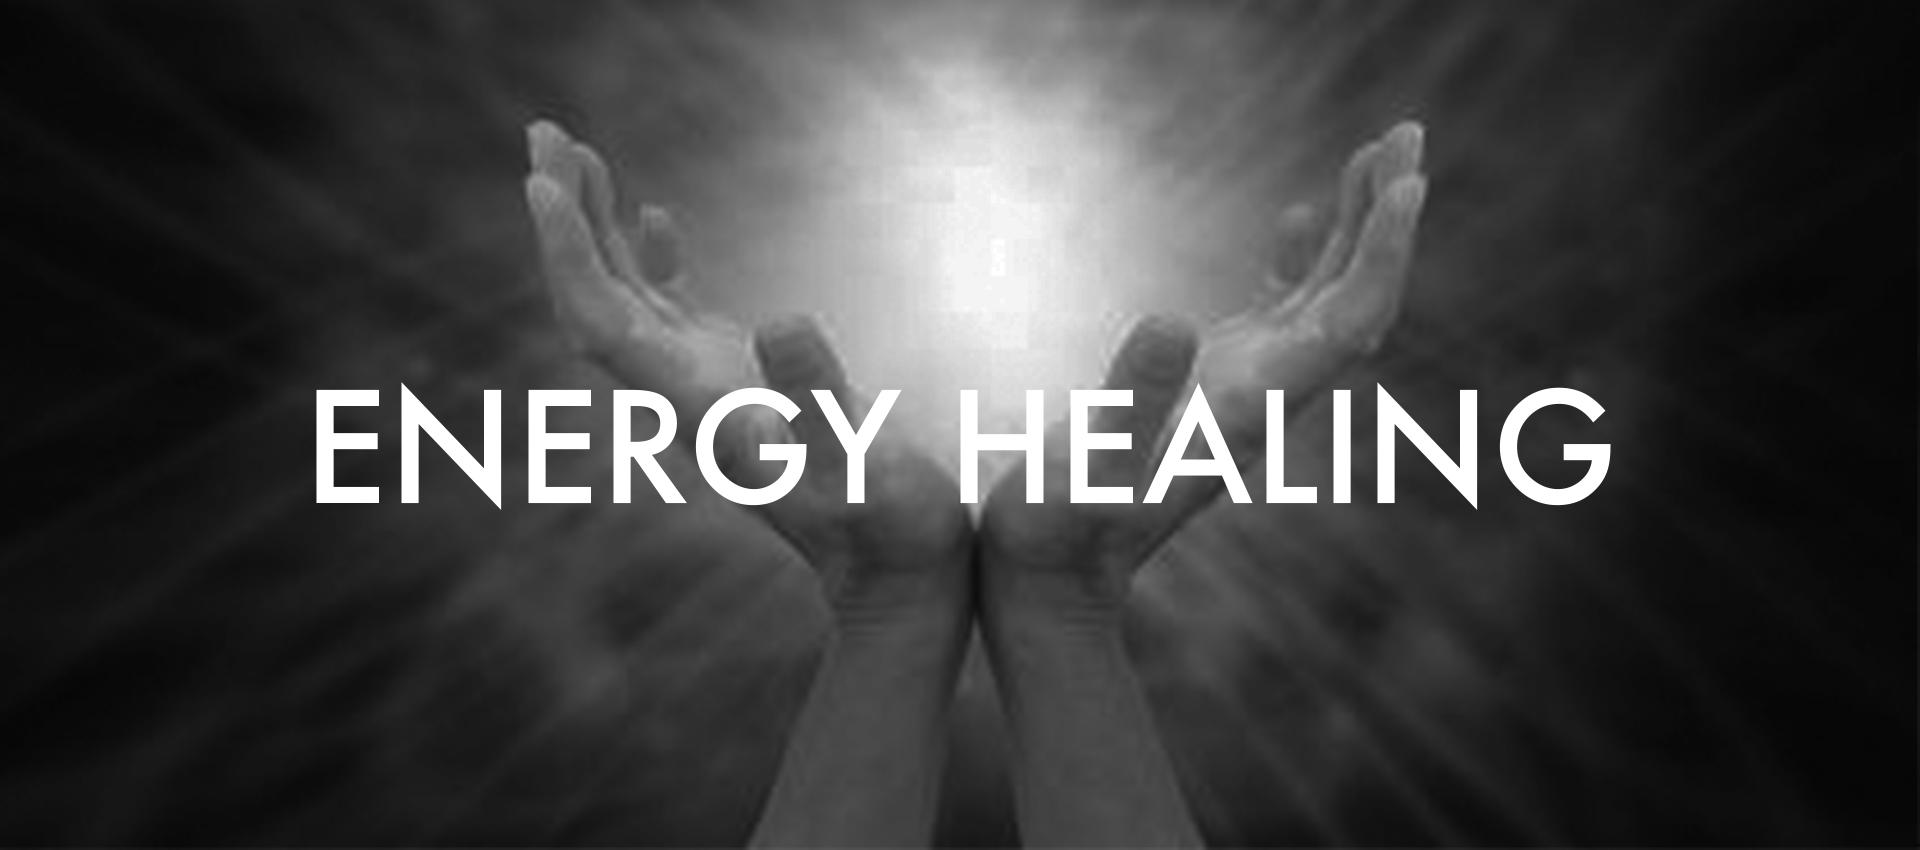 energyhealingslidebw